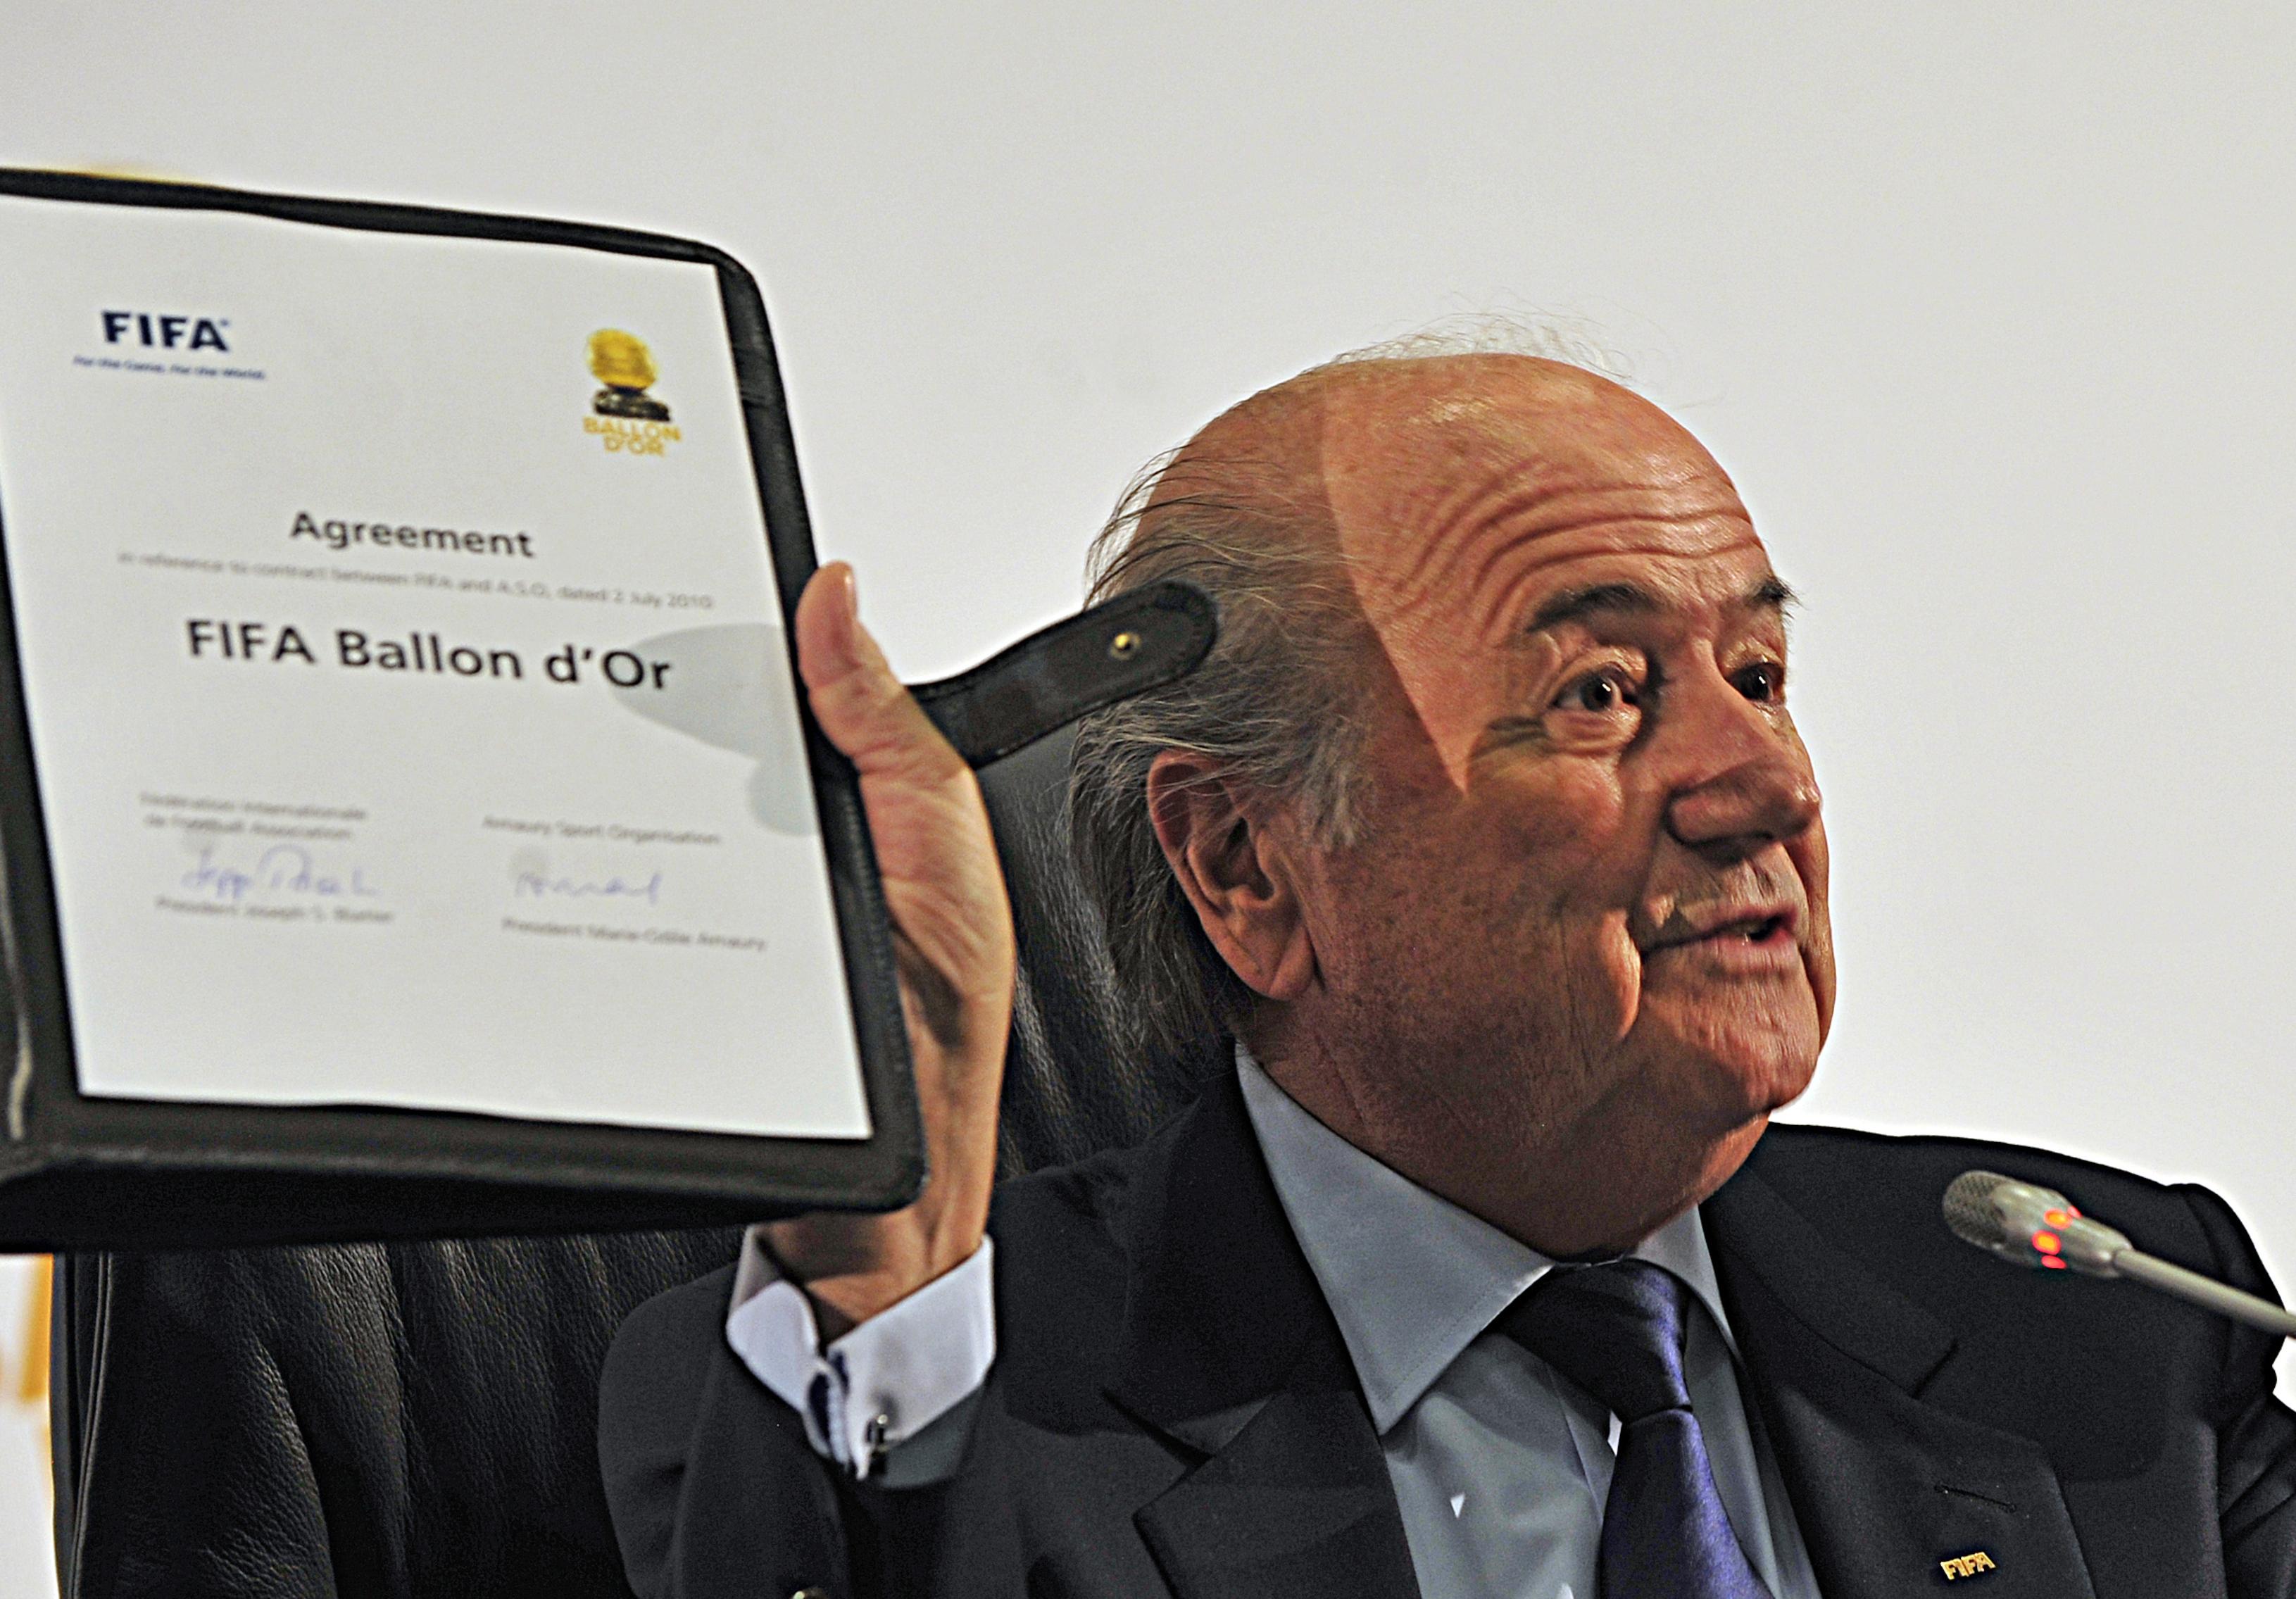 FIFAバロンドール - Wikipedia